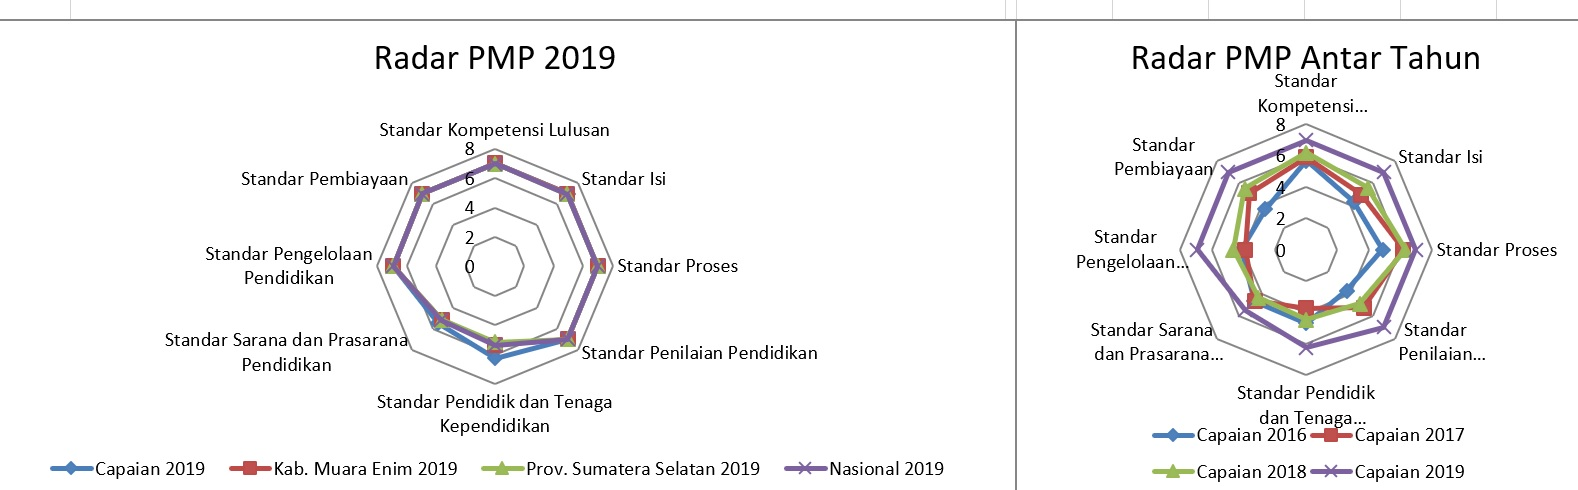 gambar rapor mutu pmp 2019